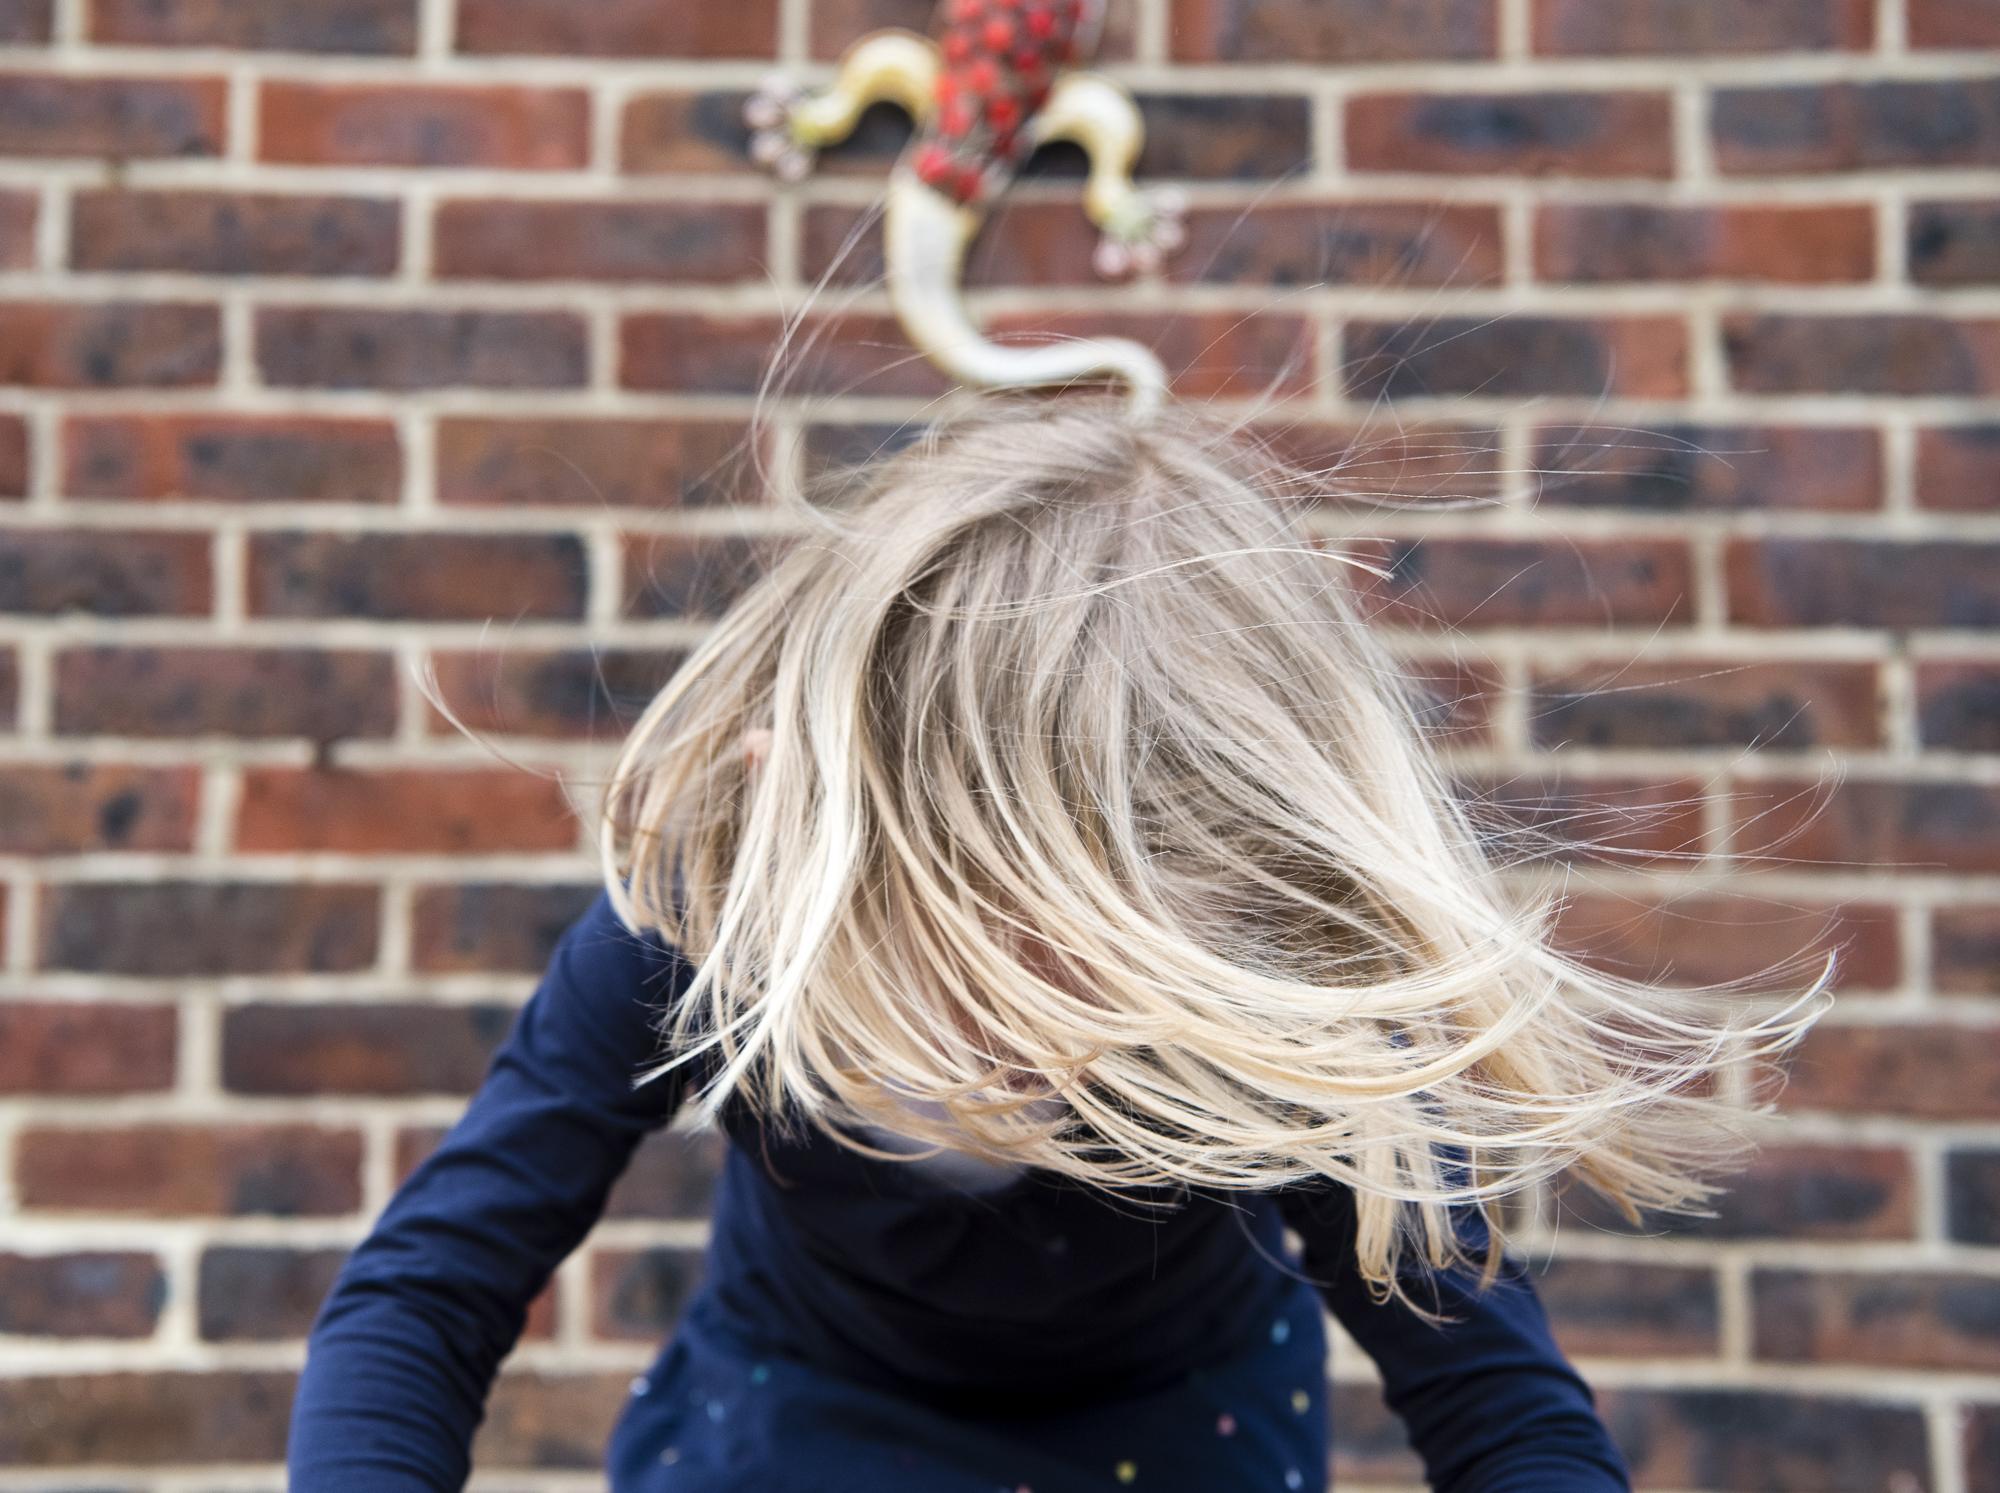 sally-hornung-photography-girl-twirling-hair.jpg